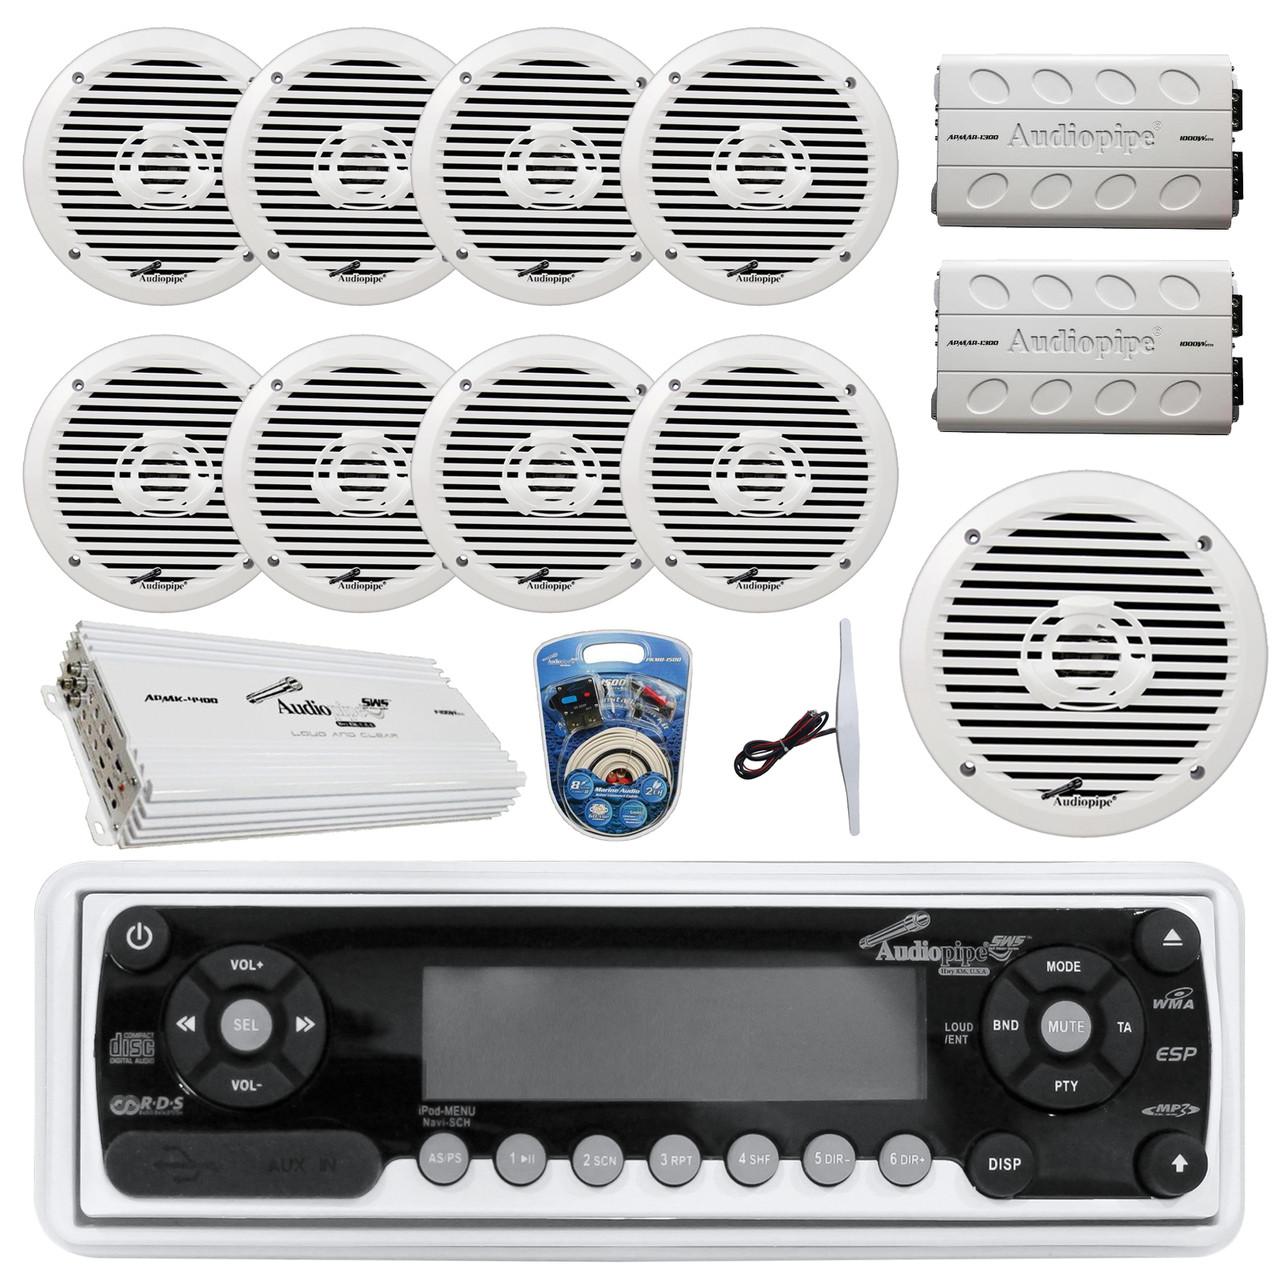 medium resolution of 36 42 boat audiopipe marine am fm cd receiver 8x 8 white boat speakers 2x 4 channel amp 1400w 10 subwoofer 2x mini 1000w amp 8 gauge marine